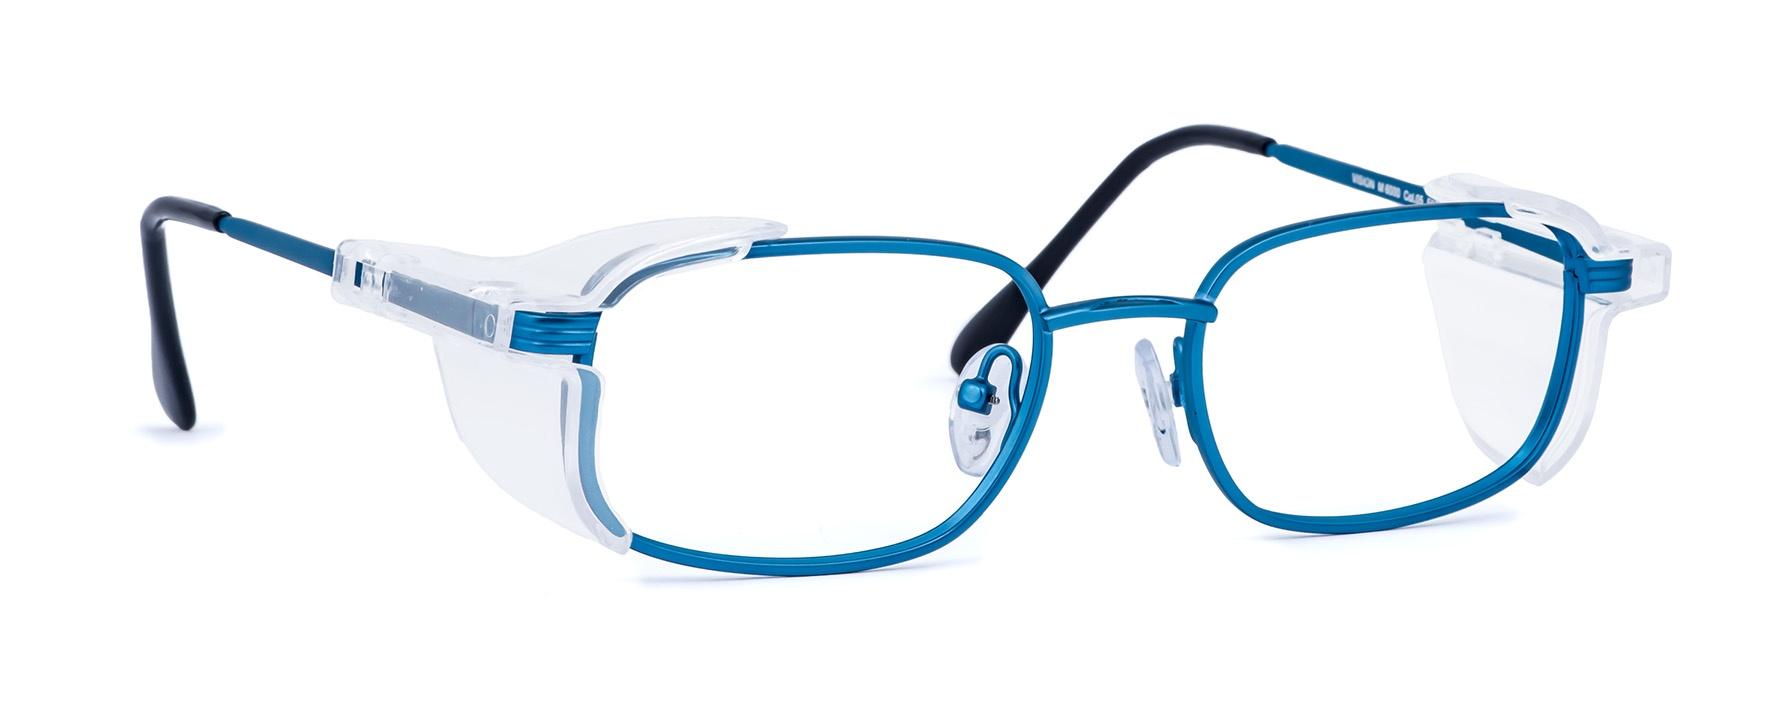 VISION M6000 6000-05-5000 (BLUE)